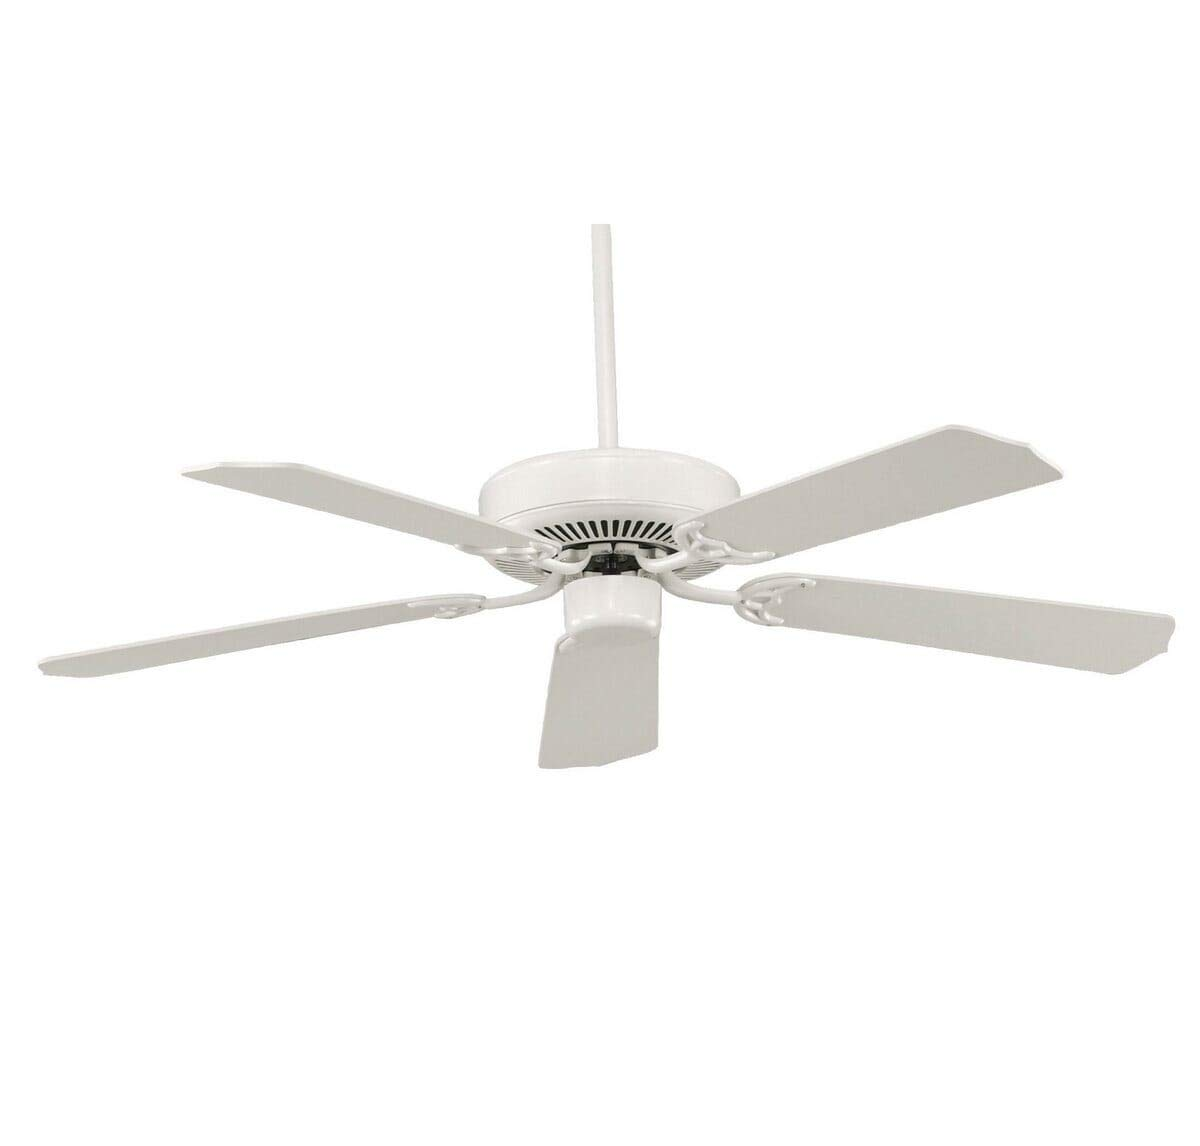 Savoy House 52-FAN-5W-WH Downrod Mount, 5 White Blades Ceiling fan, White